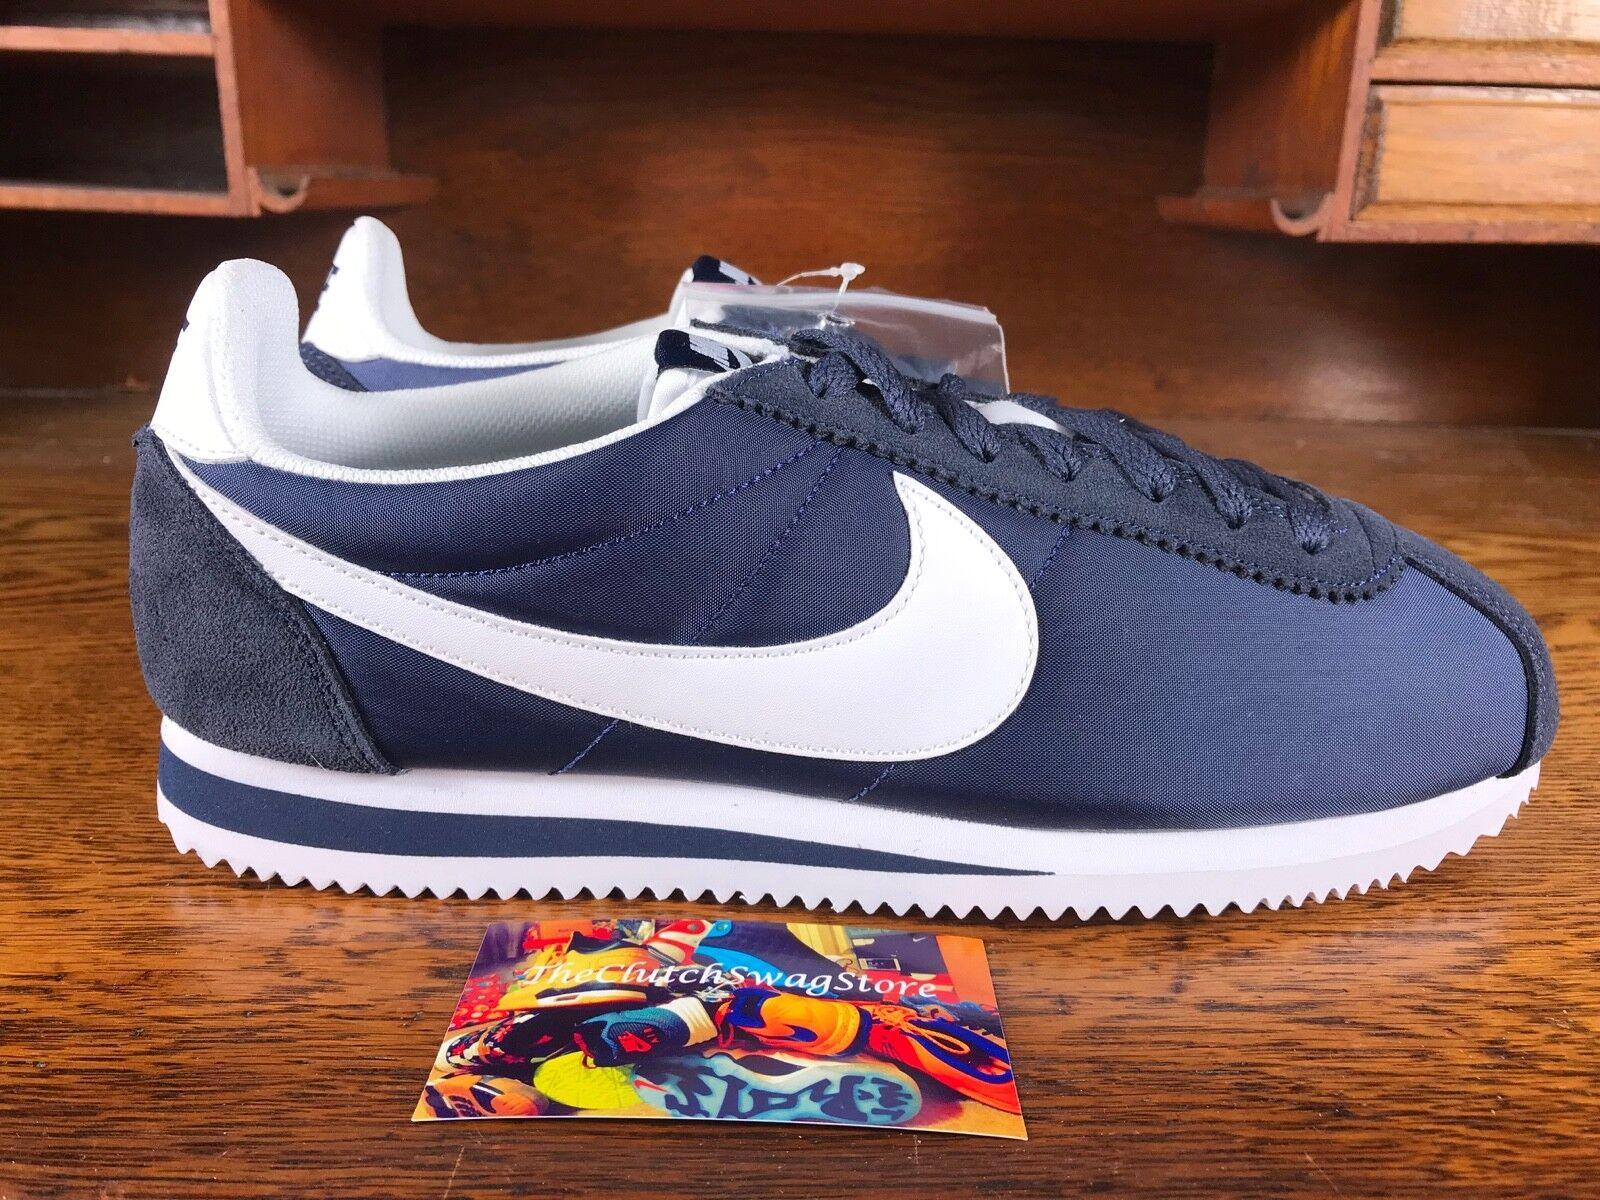 Nike cortez mens classic nylon laufschuh blau - weißer 807472 410 neuen all - szs